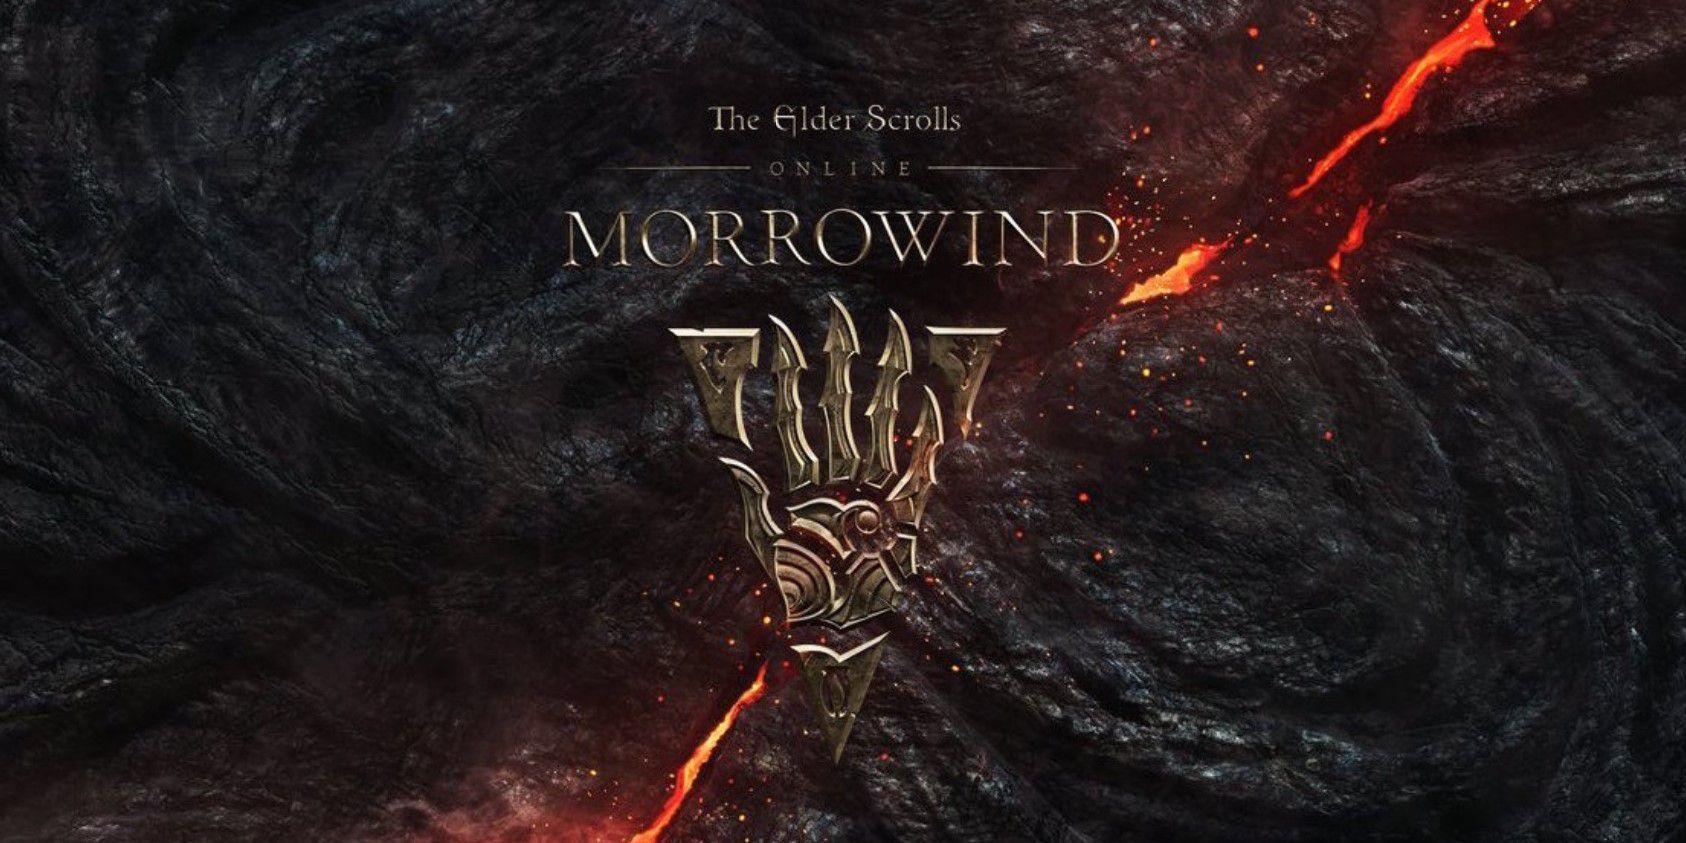 The Elder Scrolls Vita : The elder scrolls online annunciata la nuova espansione